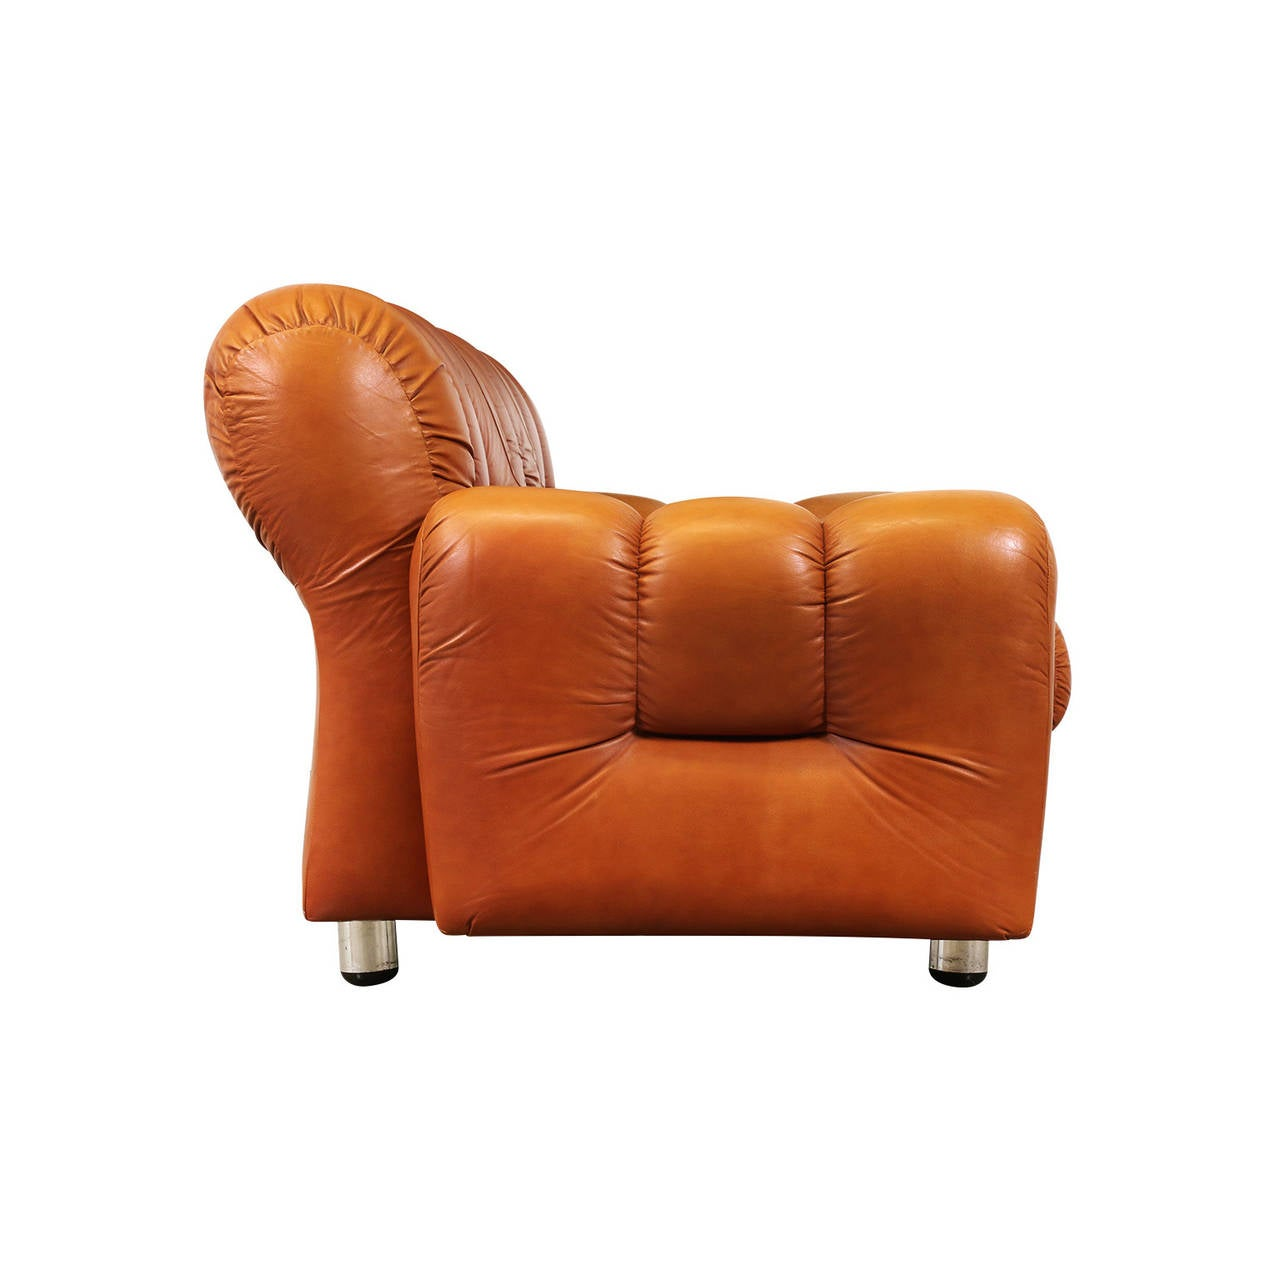 photos of tufted leather sofa